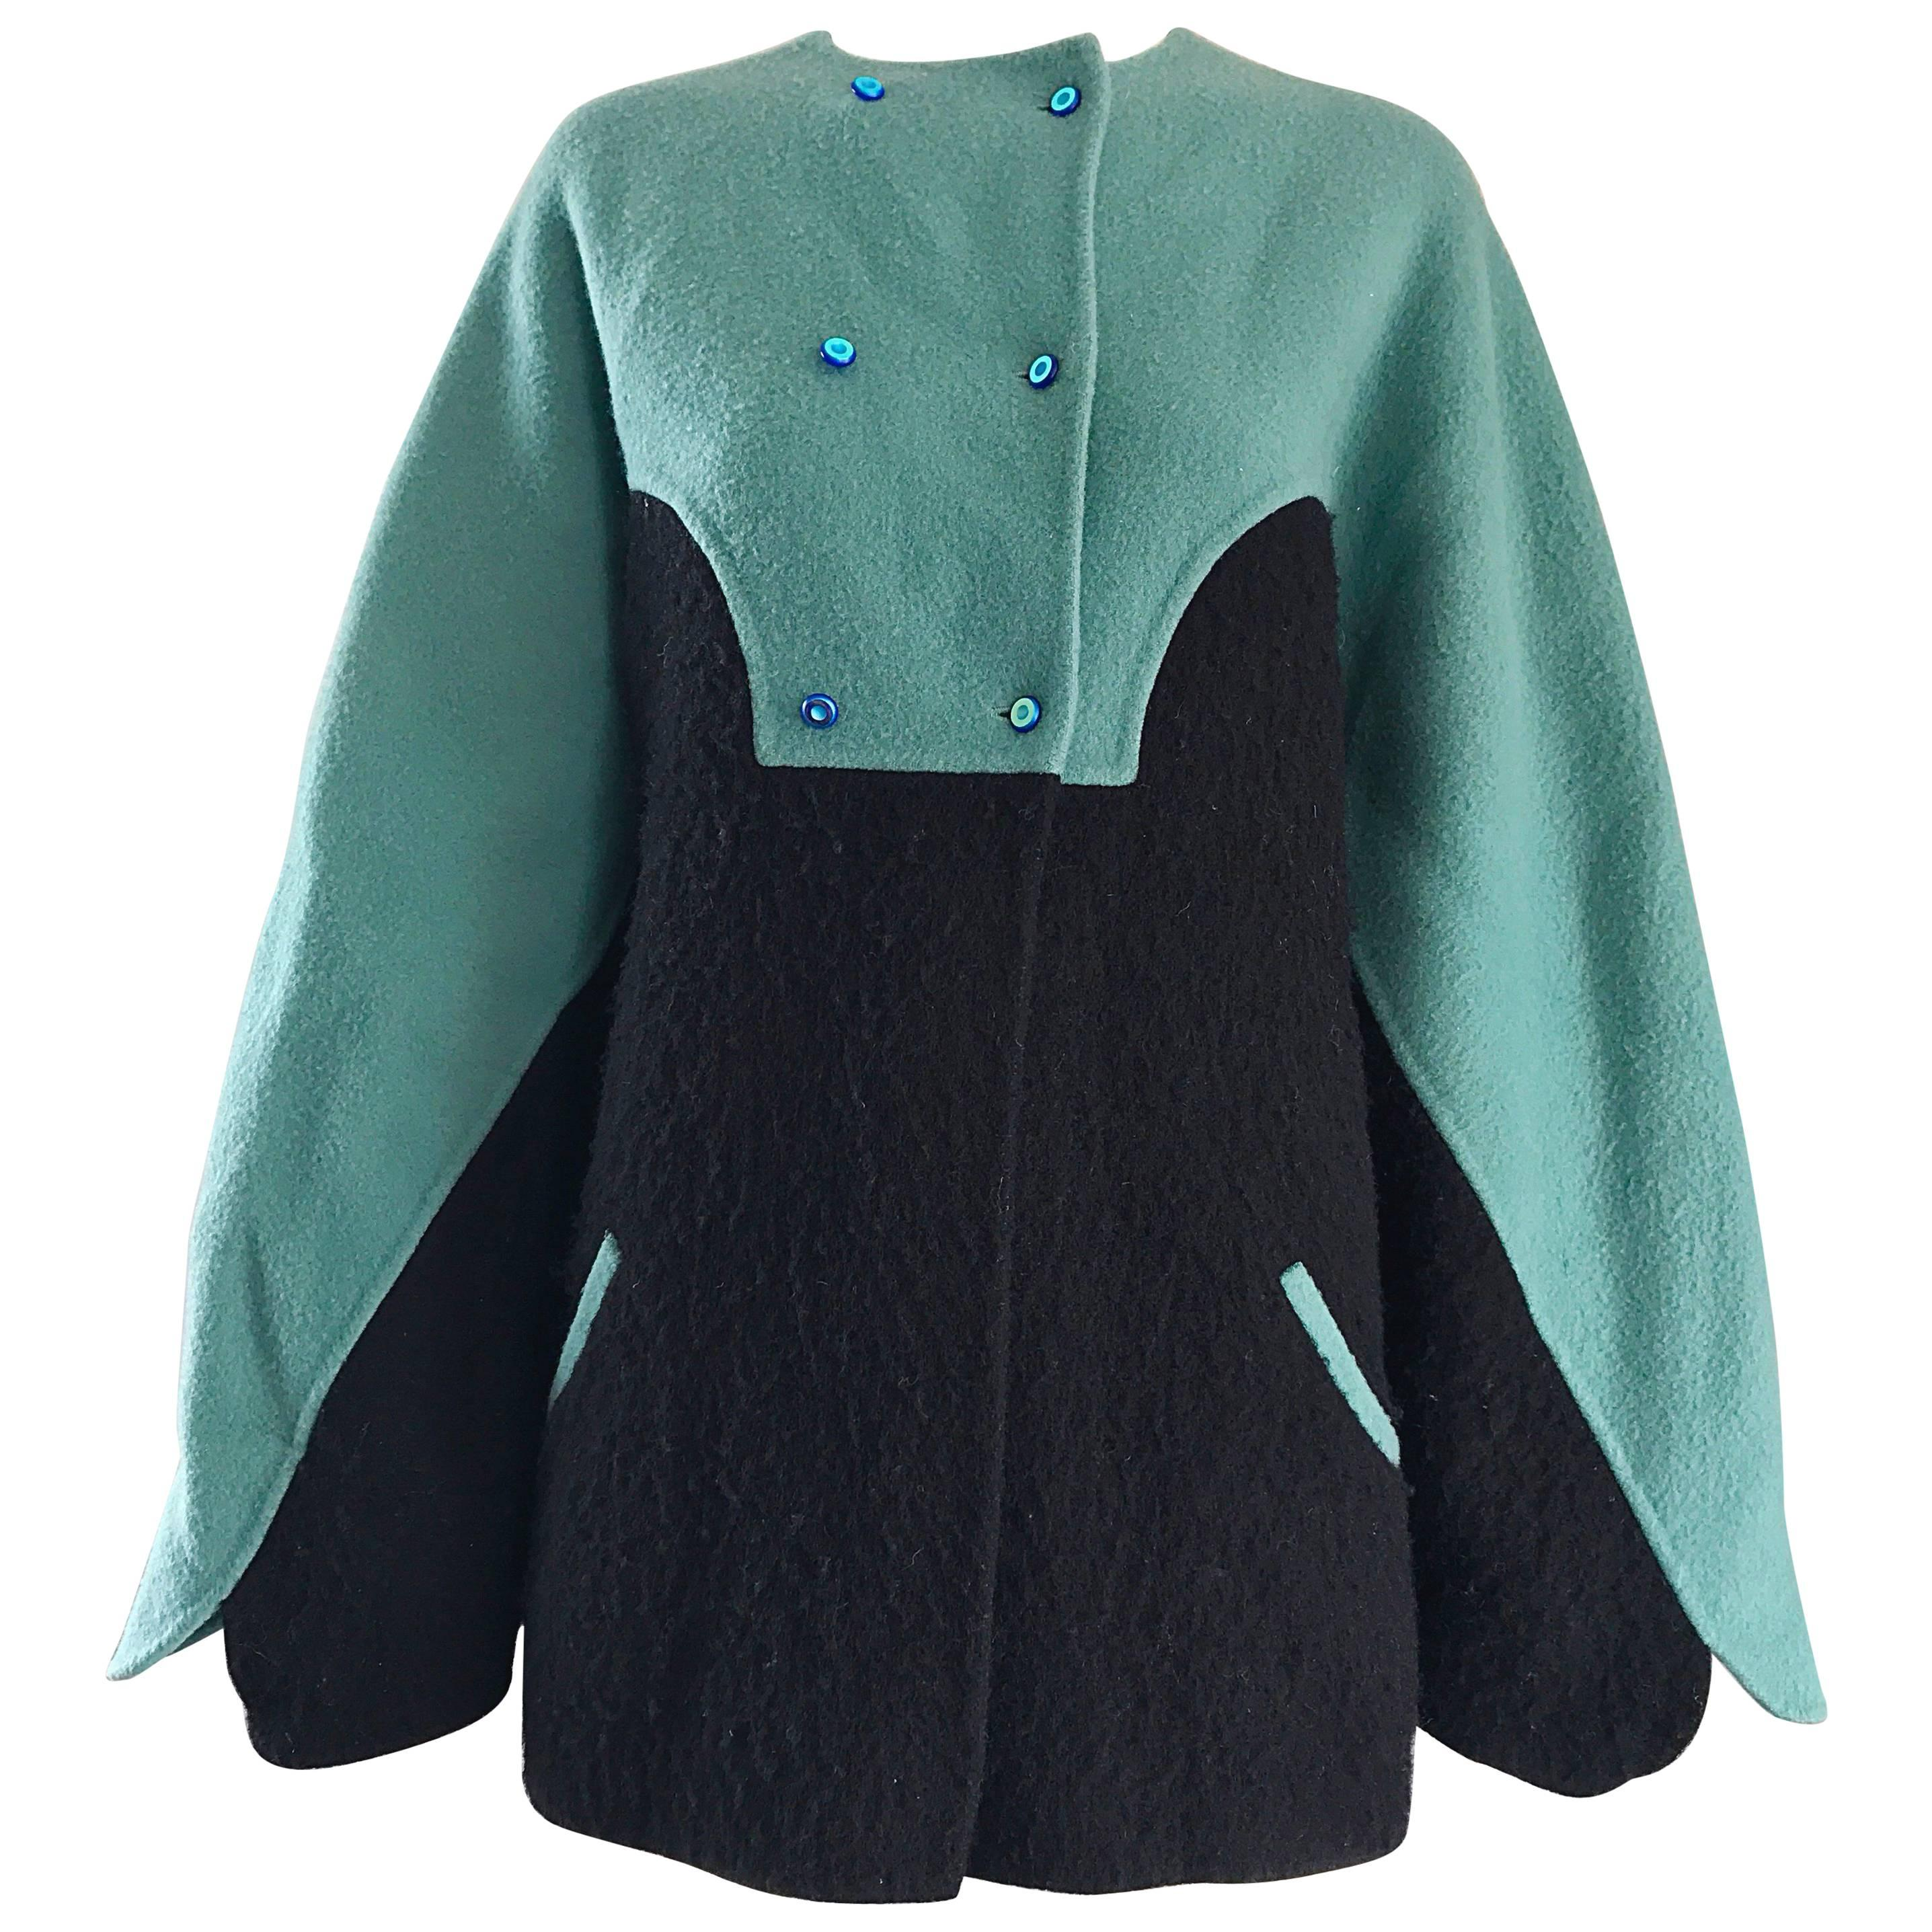 Vintage Geoffrey Beene 80s Blue Black Boiled Wool Avant Garde Swing Jacket Coat